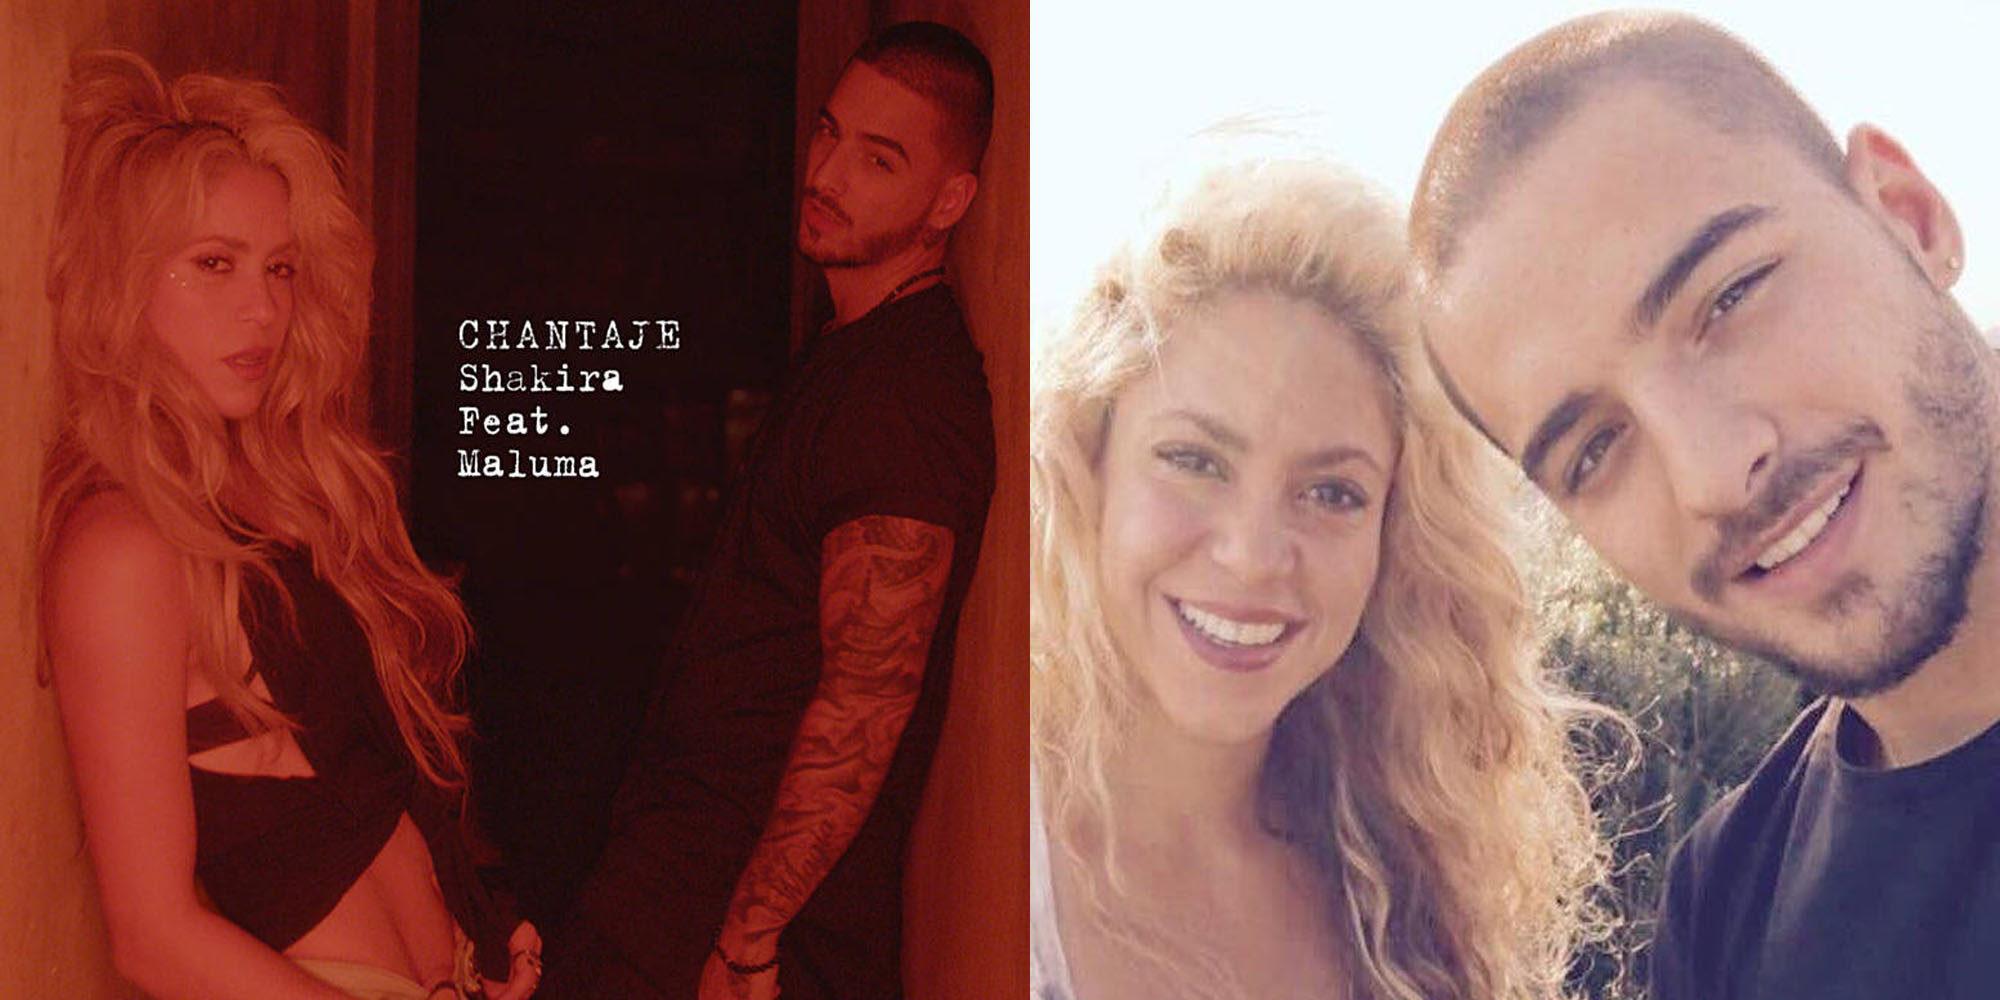 Shakira y Maluma juntos: Estrenan el single 'Chantaje'